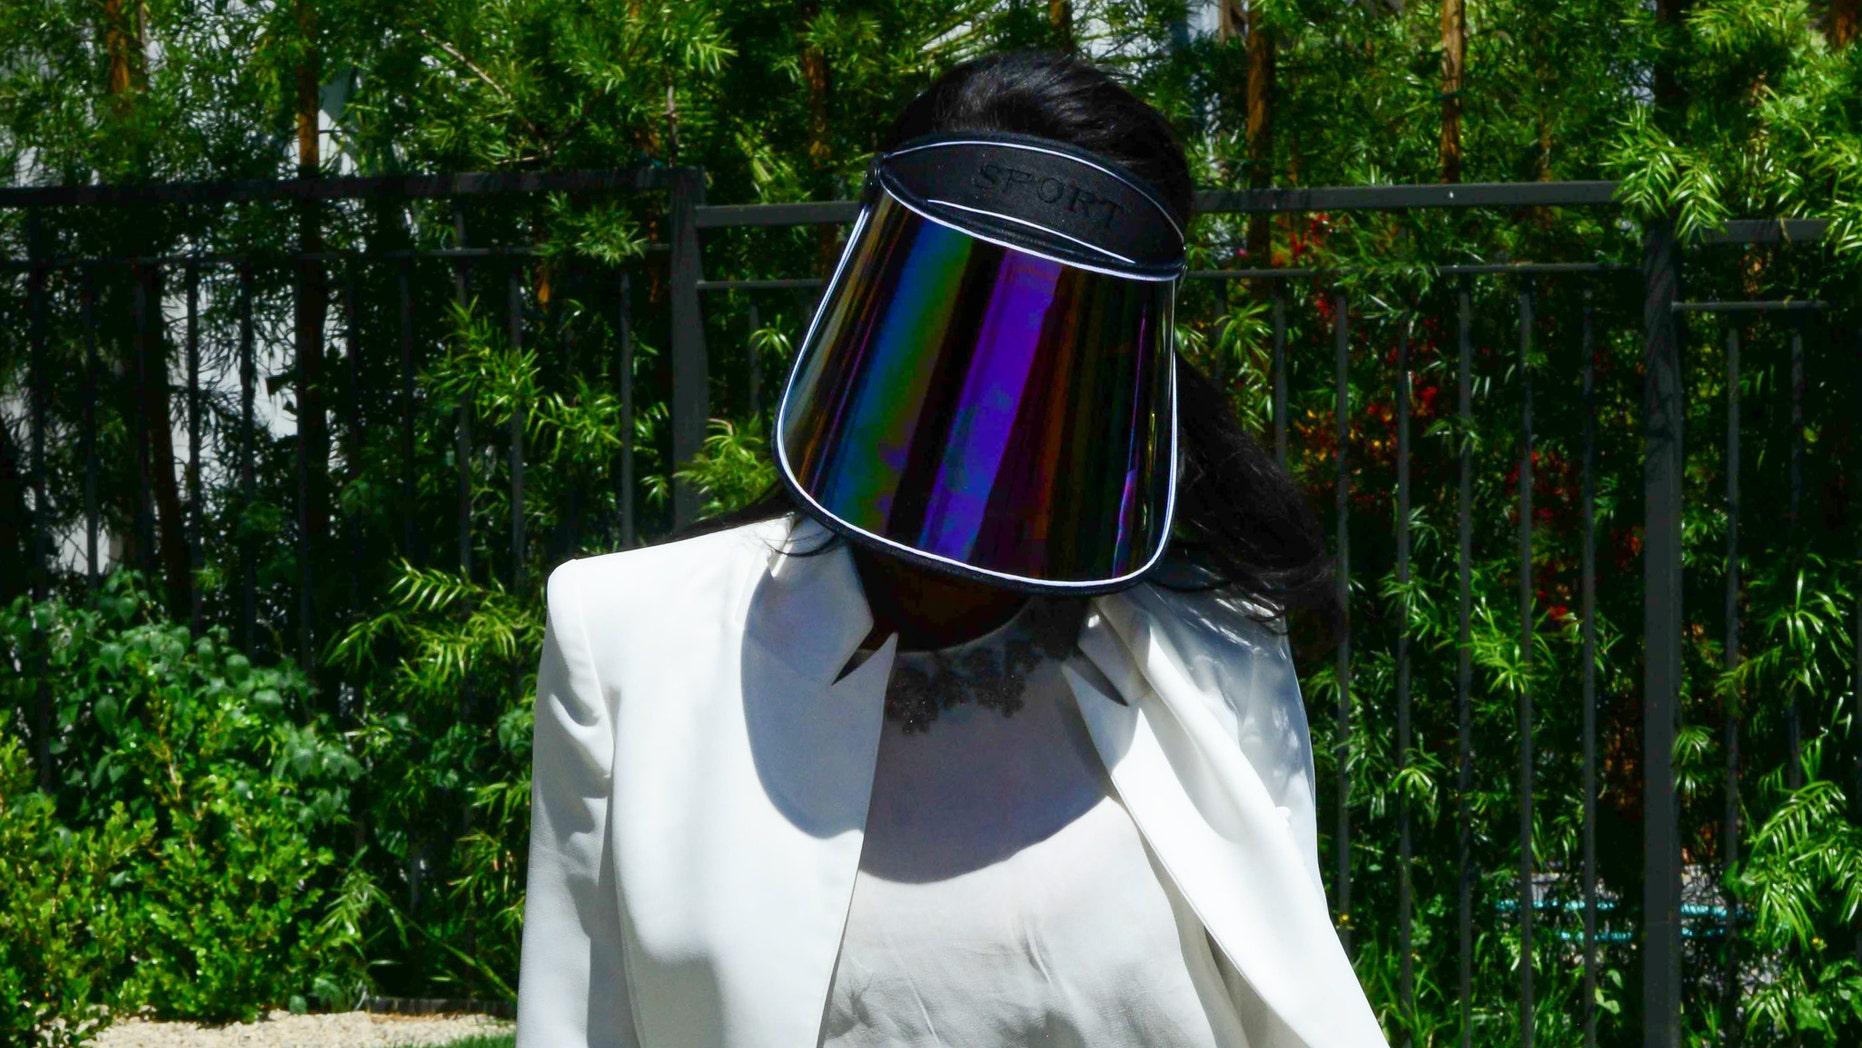 V. Stiviano on May 02, 2014 in Los Angeles, California.